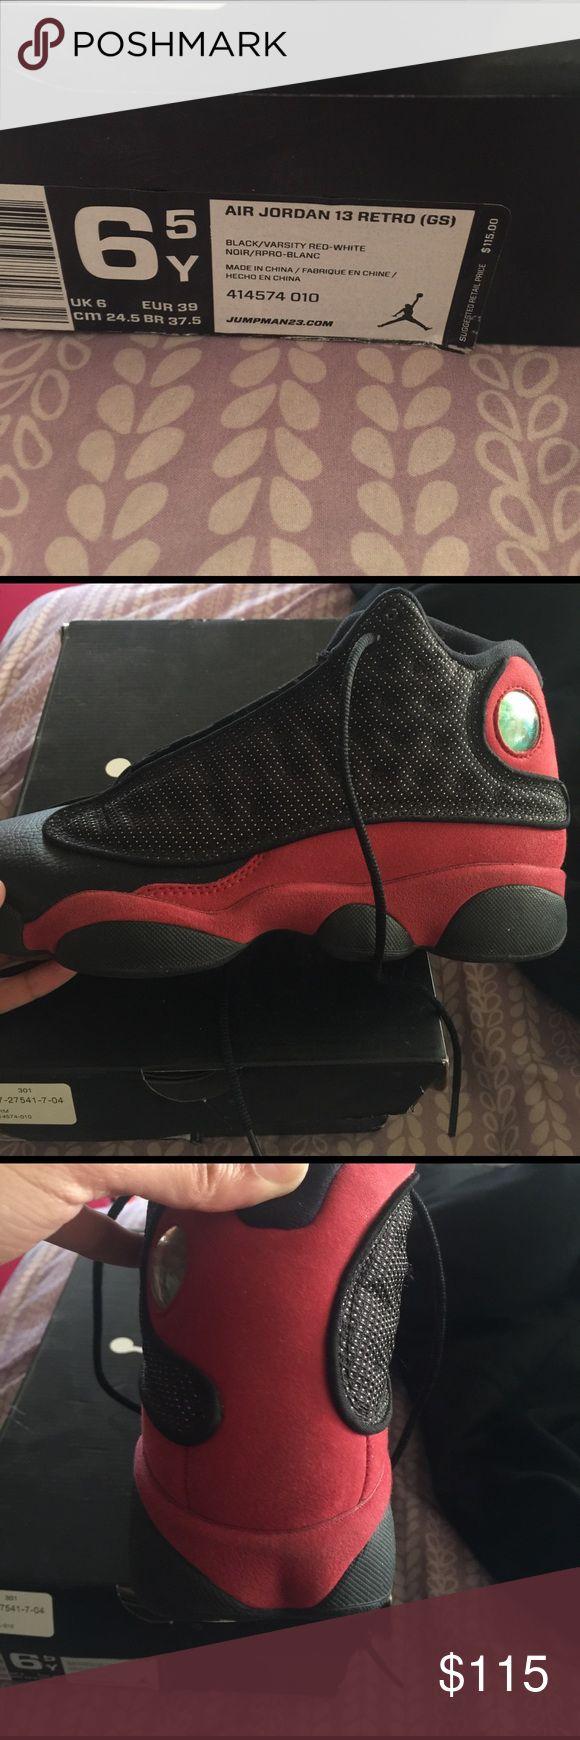 6.5 Retro 13s Authentic Jordan Shoes Sneakers